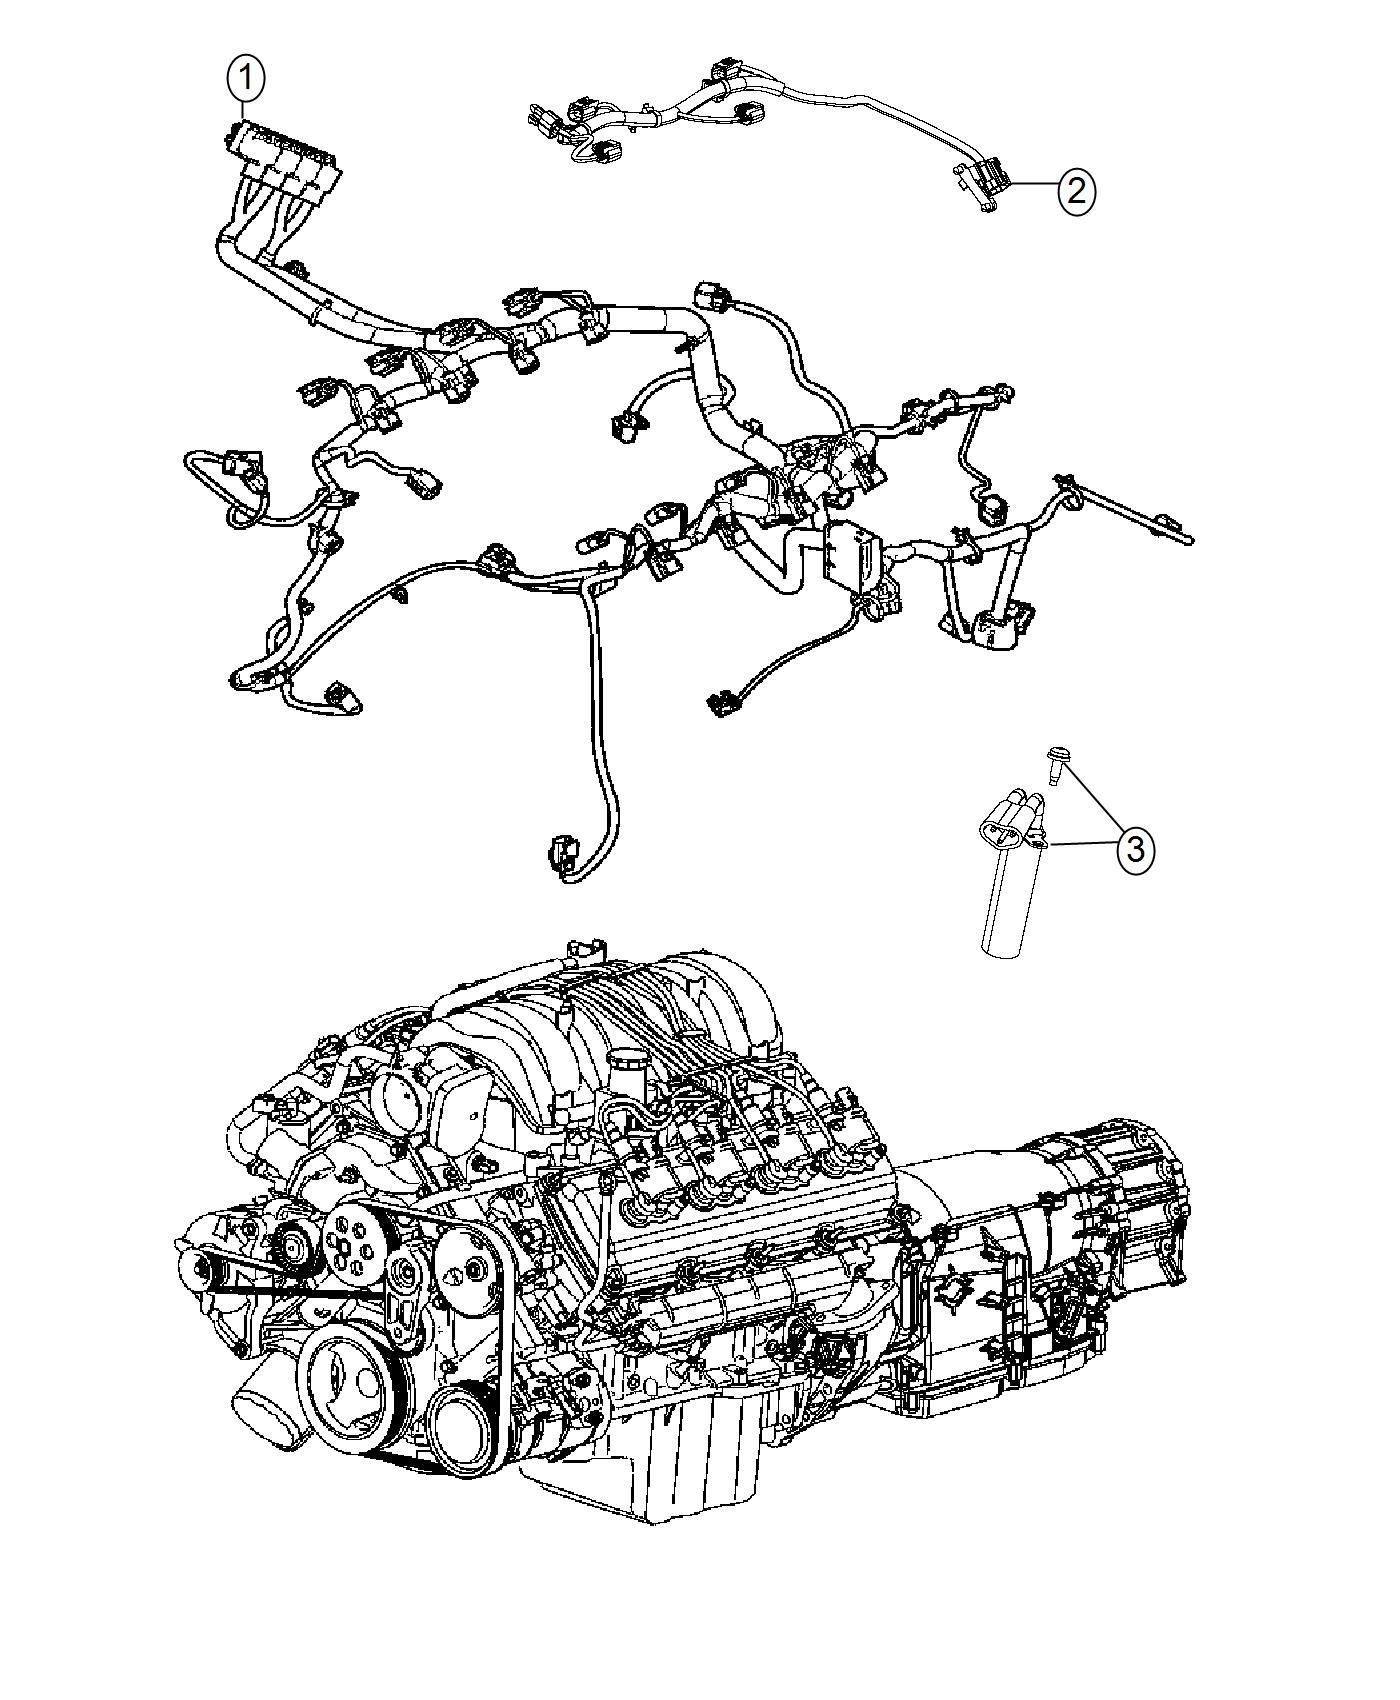 Jeep Grand Cherokee Wiring Engine Powertrain Mopar